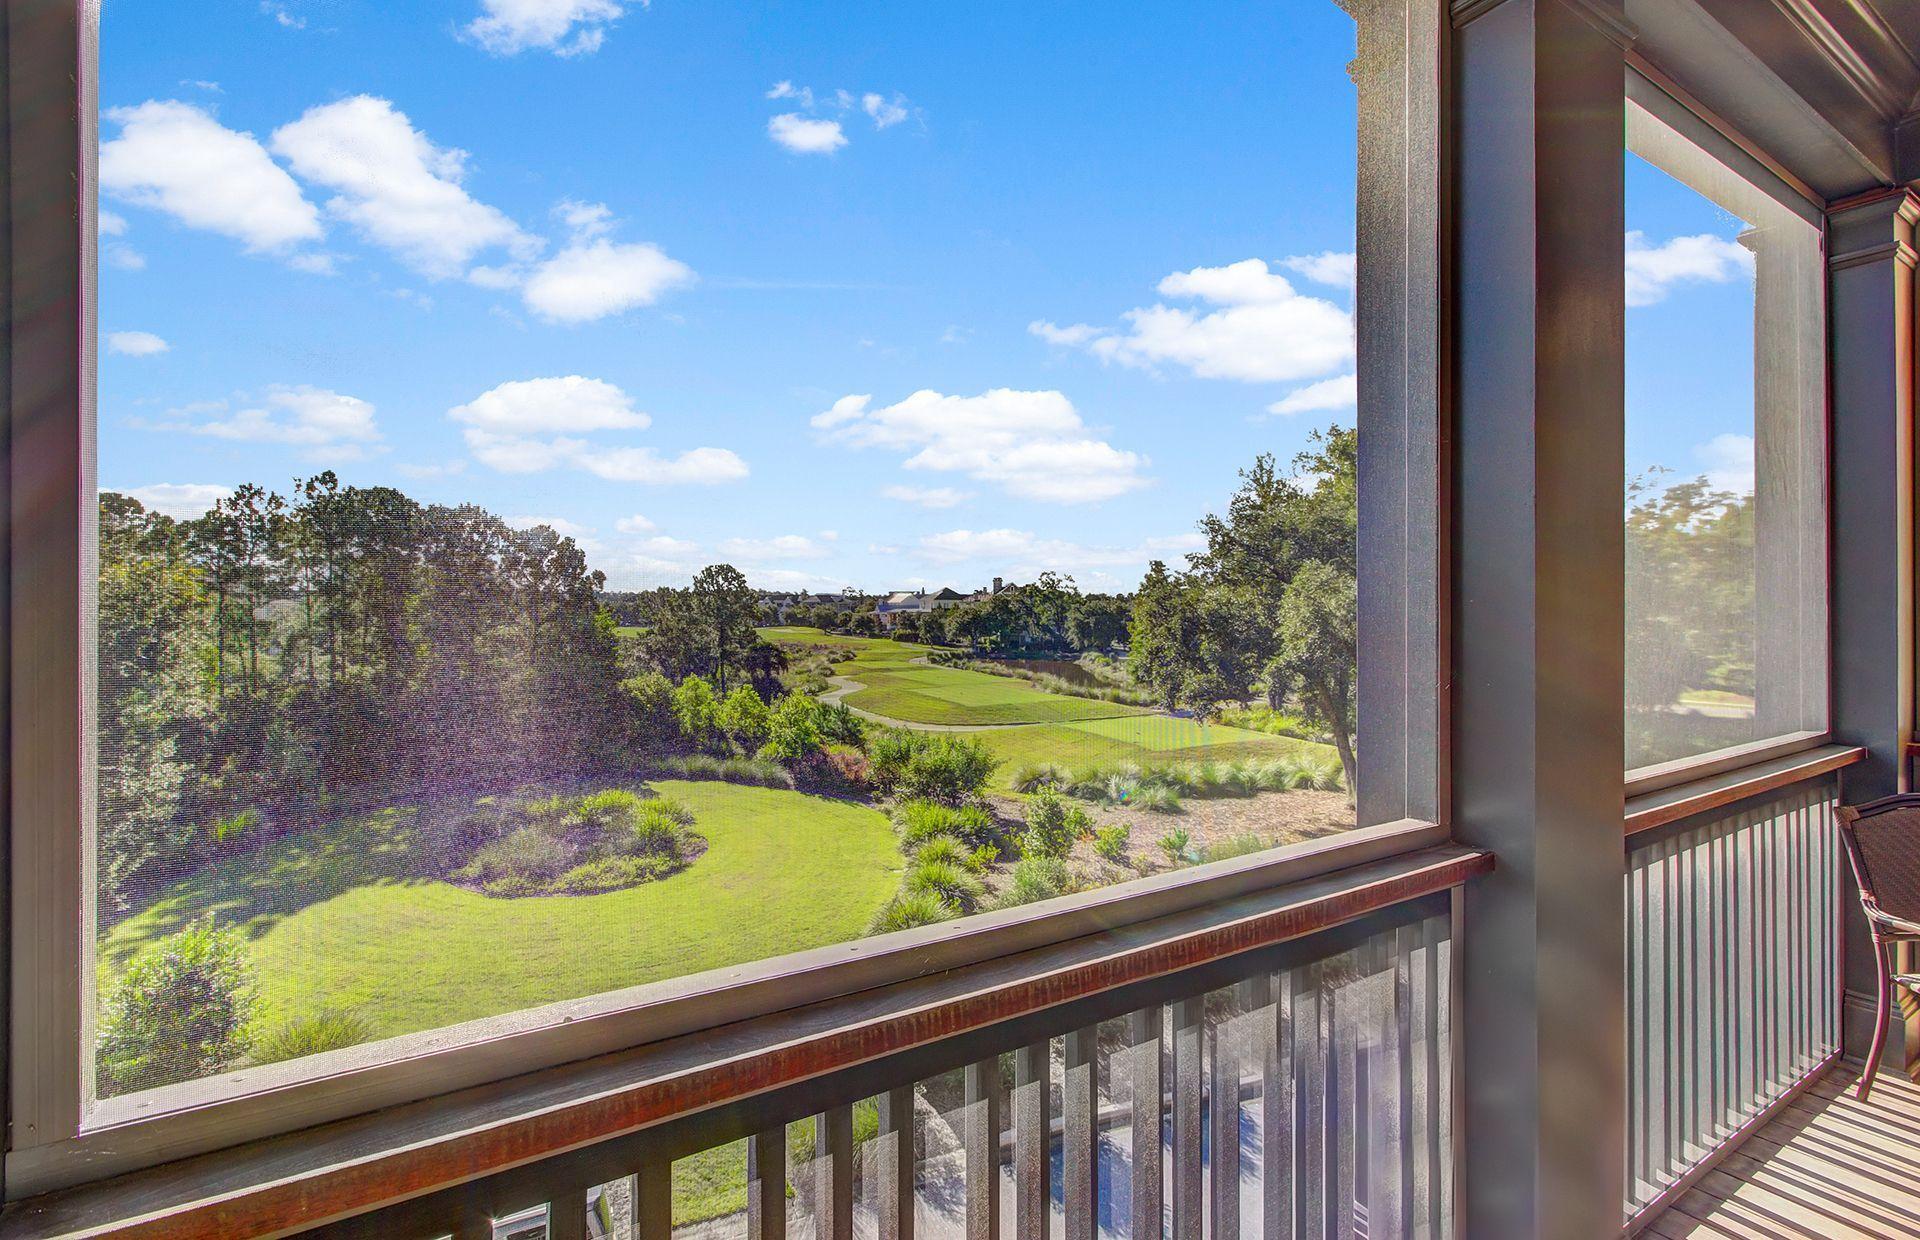 Daniel Island Park Homes For Sale - 250 Island Park, Charleston, SC - 31